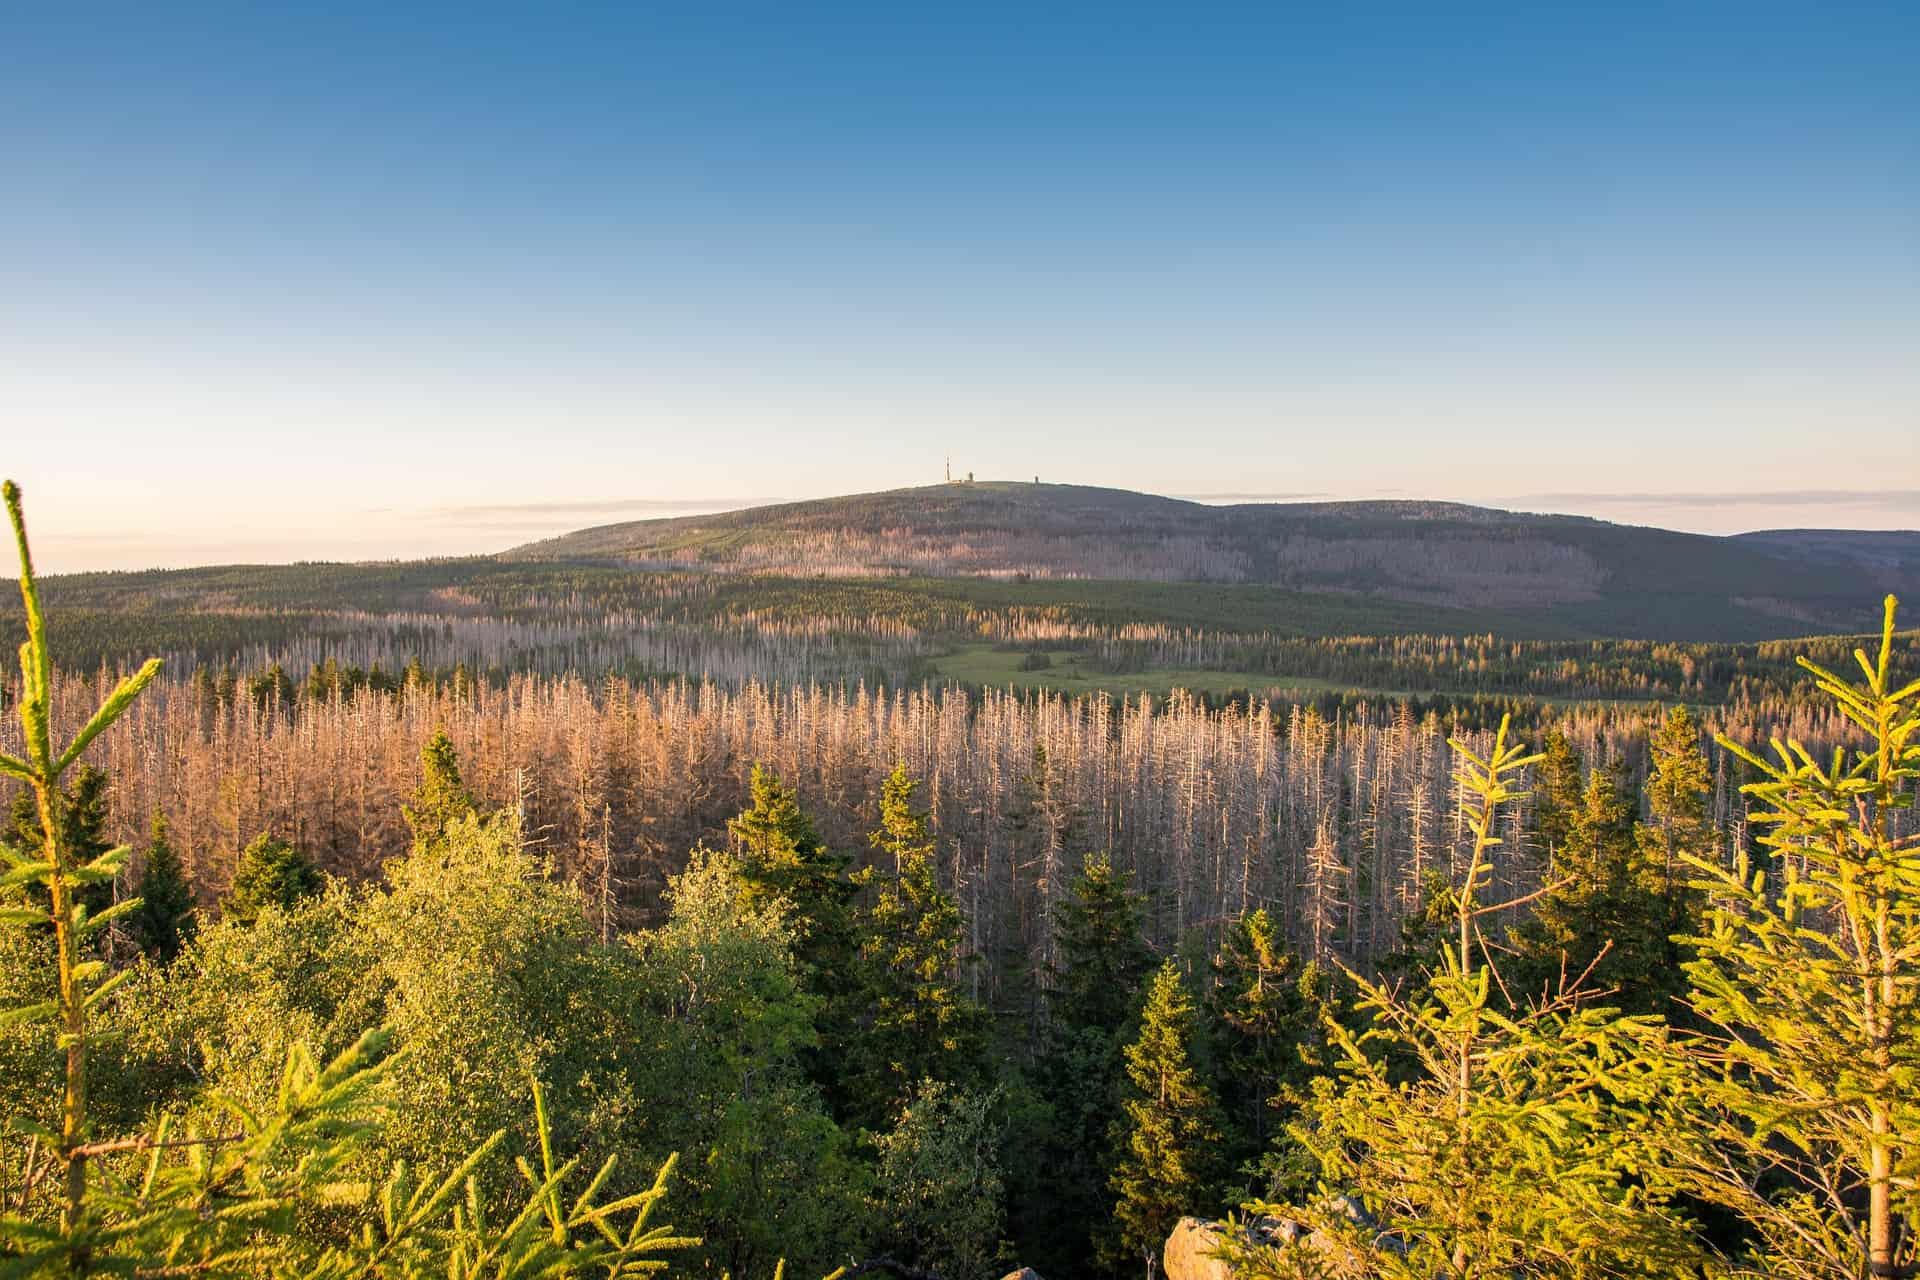 Harzgebirge